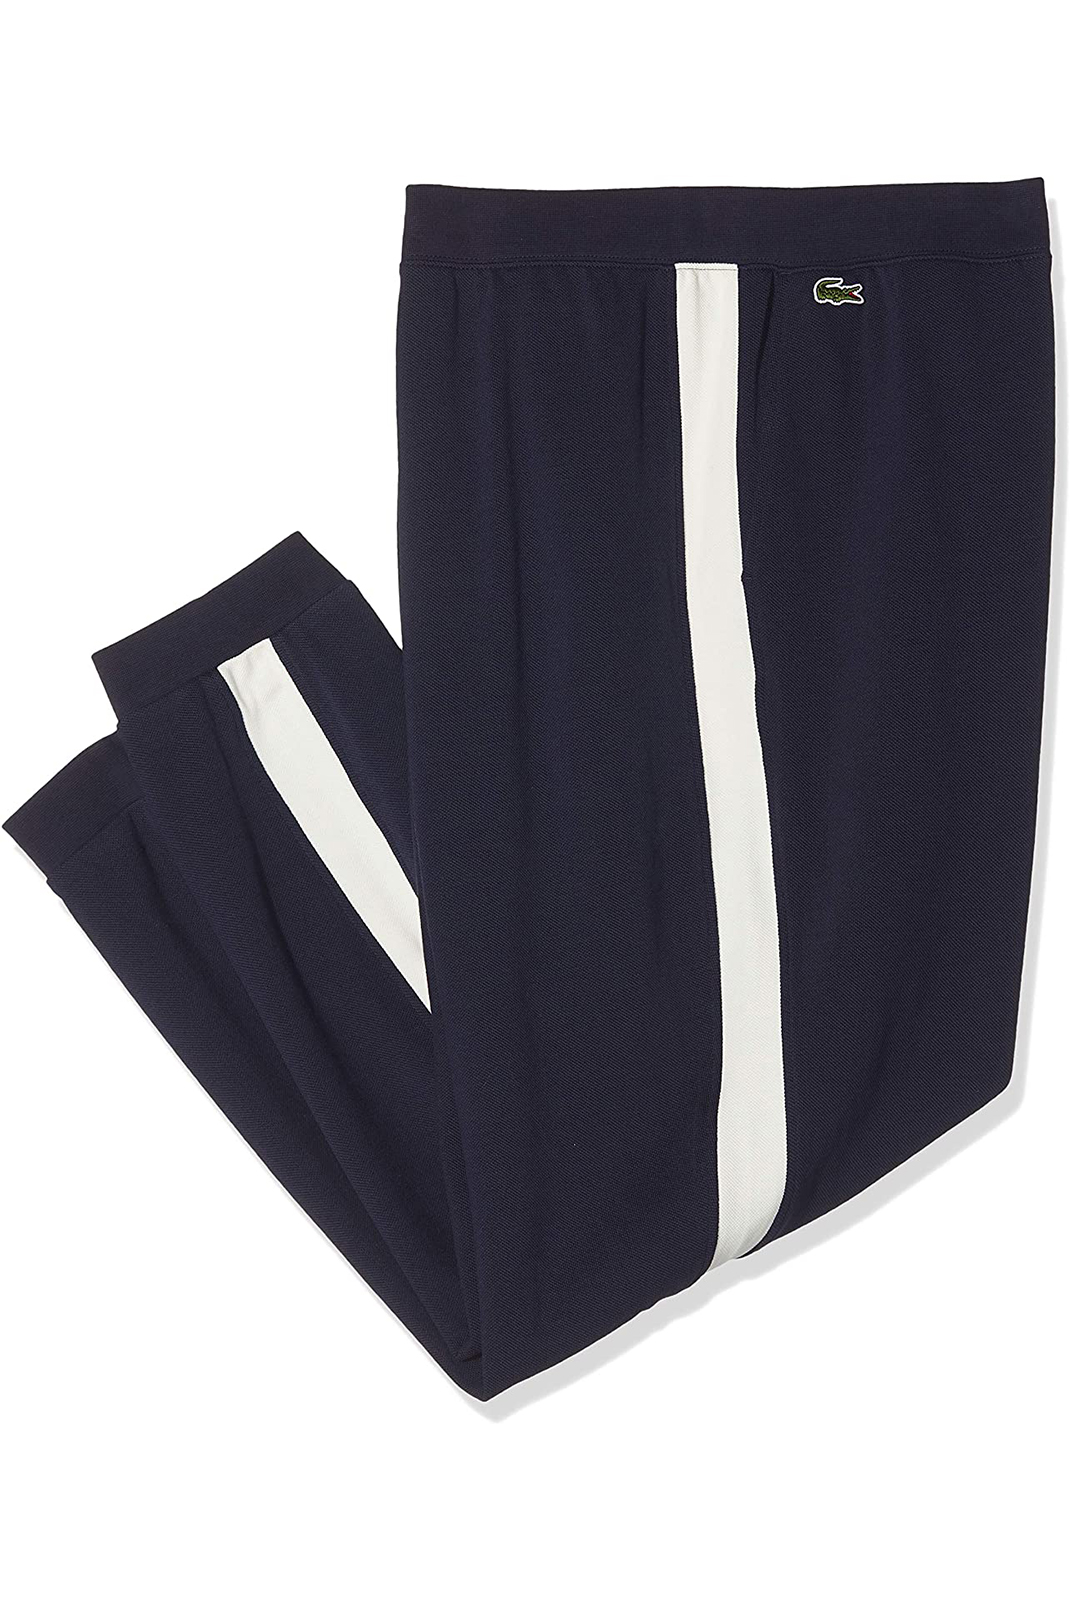 Pantalons sport/streetwear  Lacoste XH4376 00D8S marine - blanc